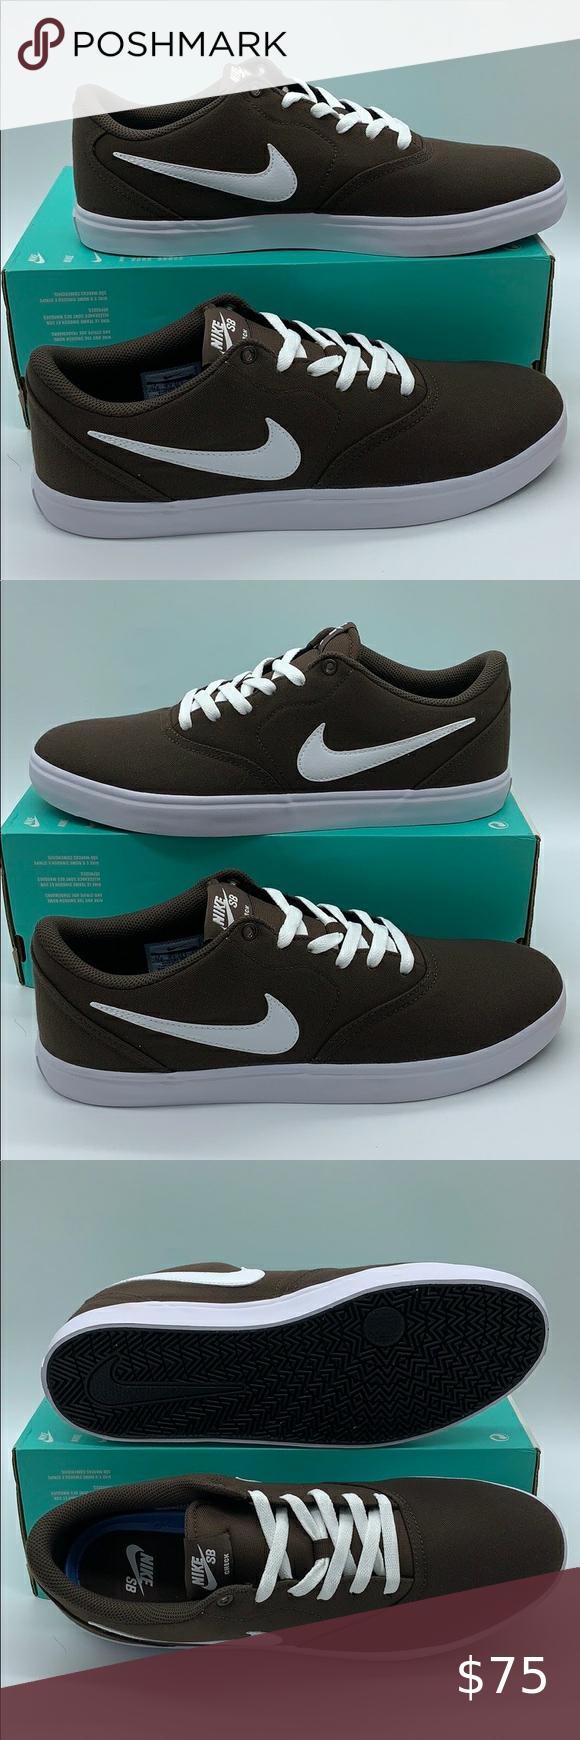 Nike Sb Check Solar Cnvs Baroque Brown White White Brand Men S Shoes Nike Sb